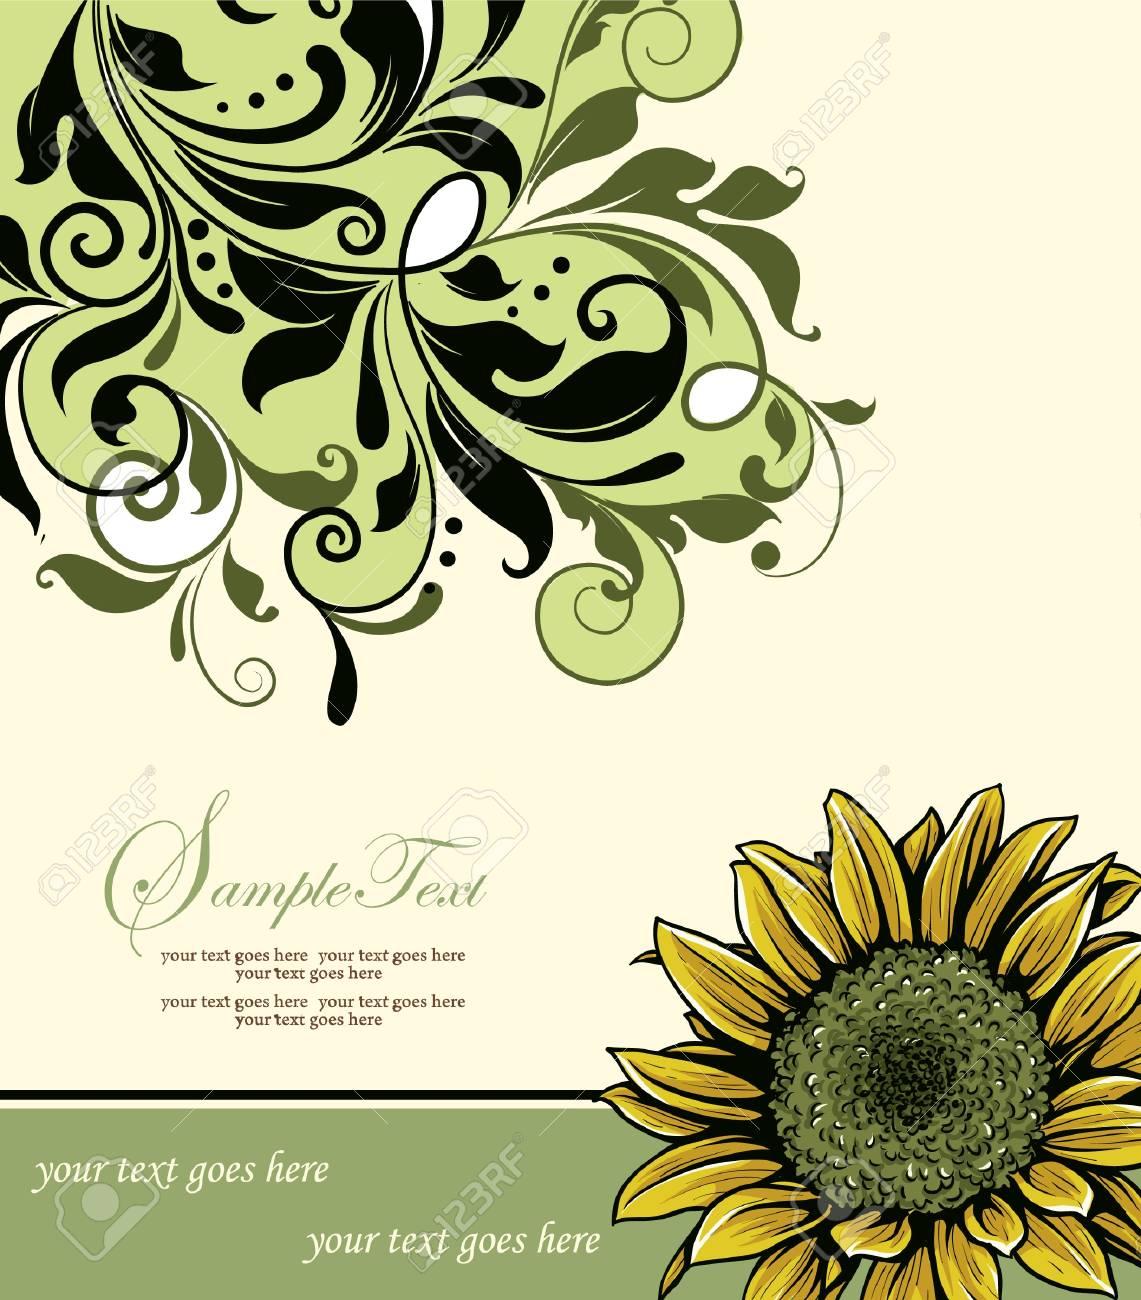 Vintage Elegant Sunflower Wedding Invitation Royalty Free Cliparts ...